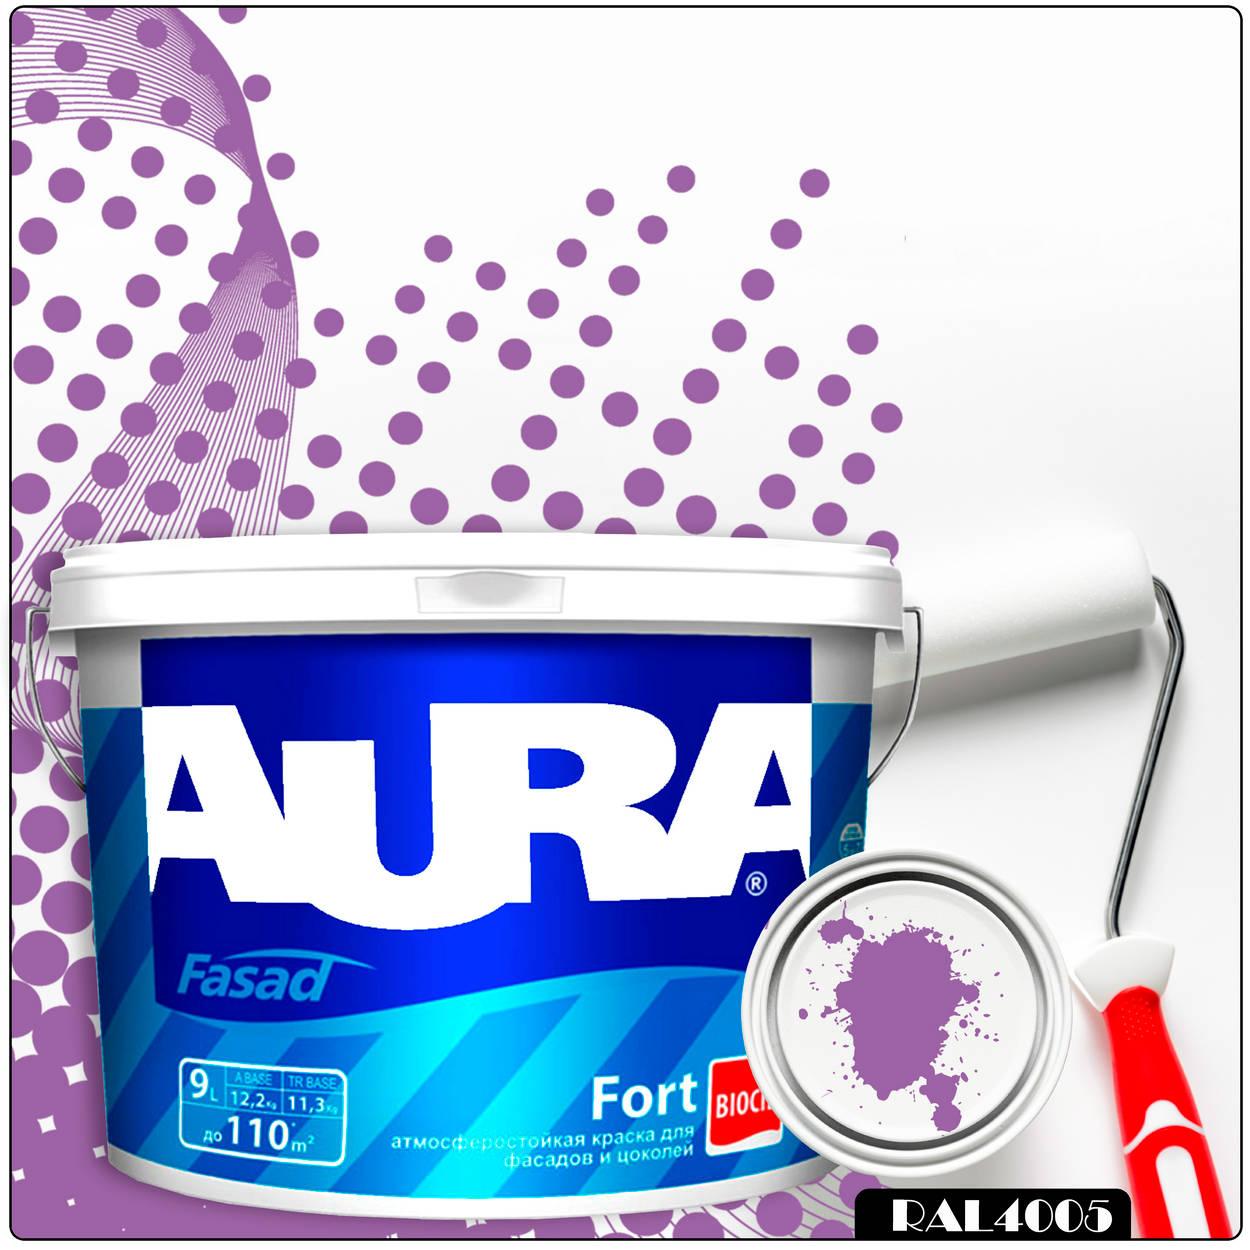 Фото 5 - Краска Aura Fasad Fort, RAL 4005 Сине-сиреневый, латексная, матовая, для фасада и цоколей, 9л, Аура.